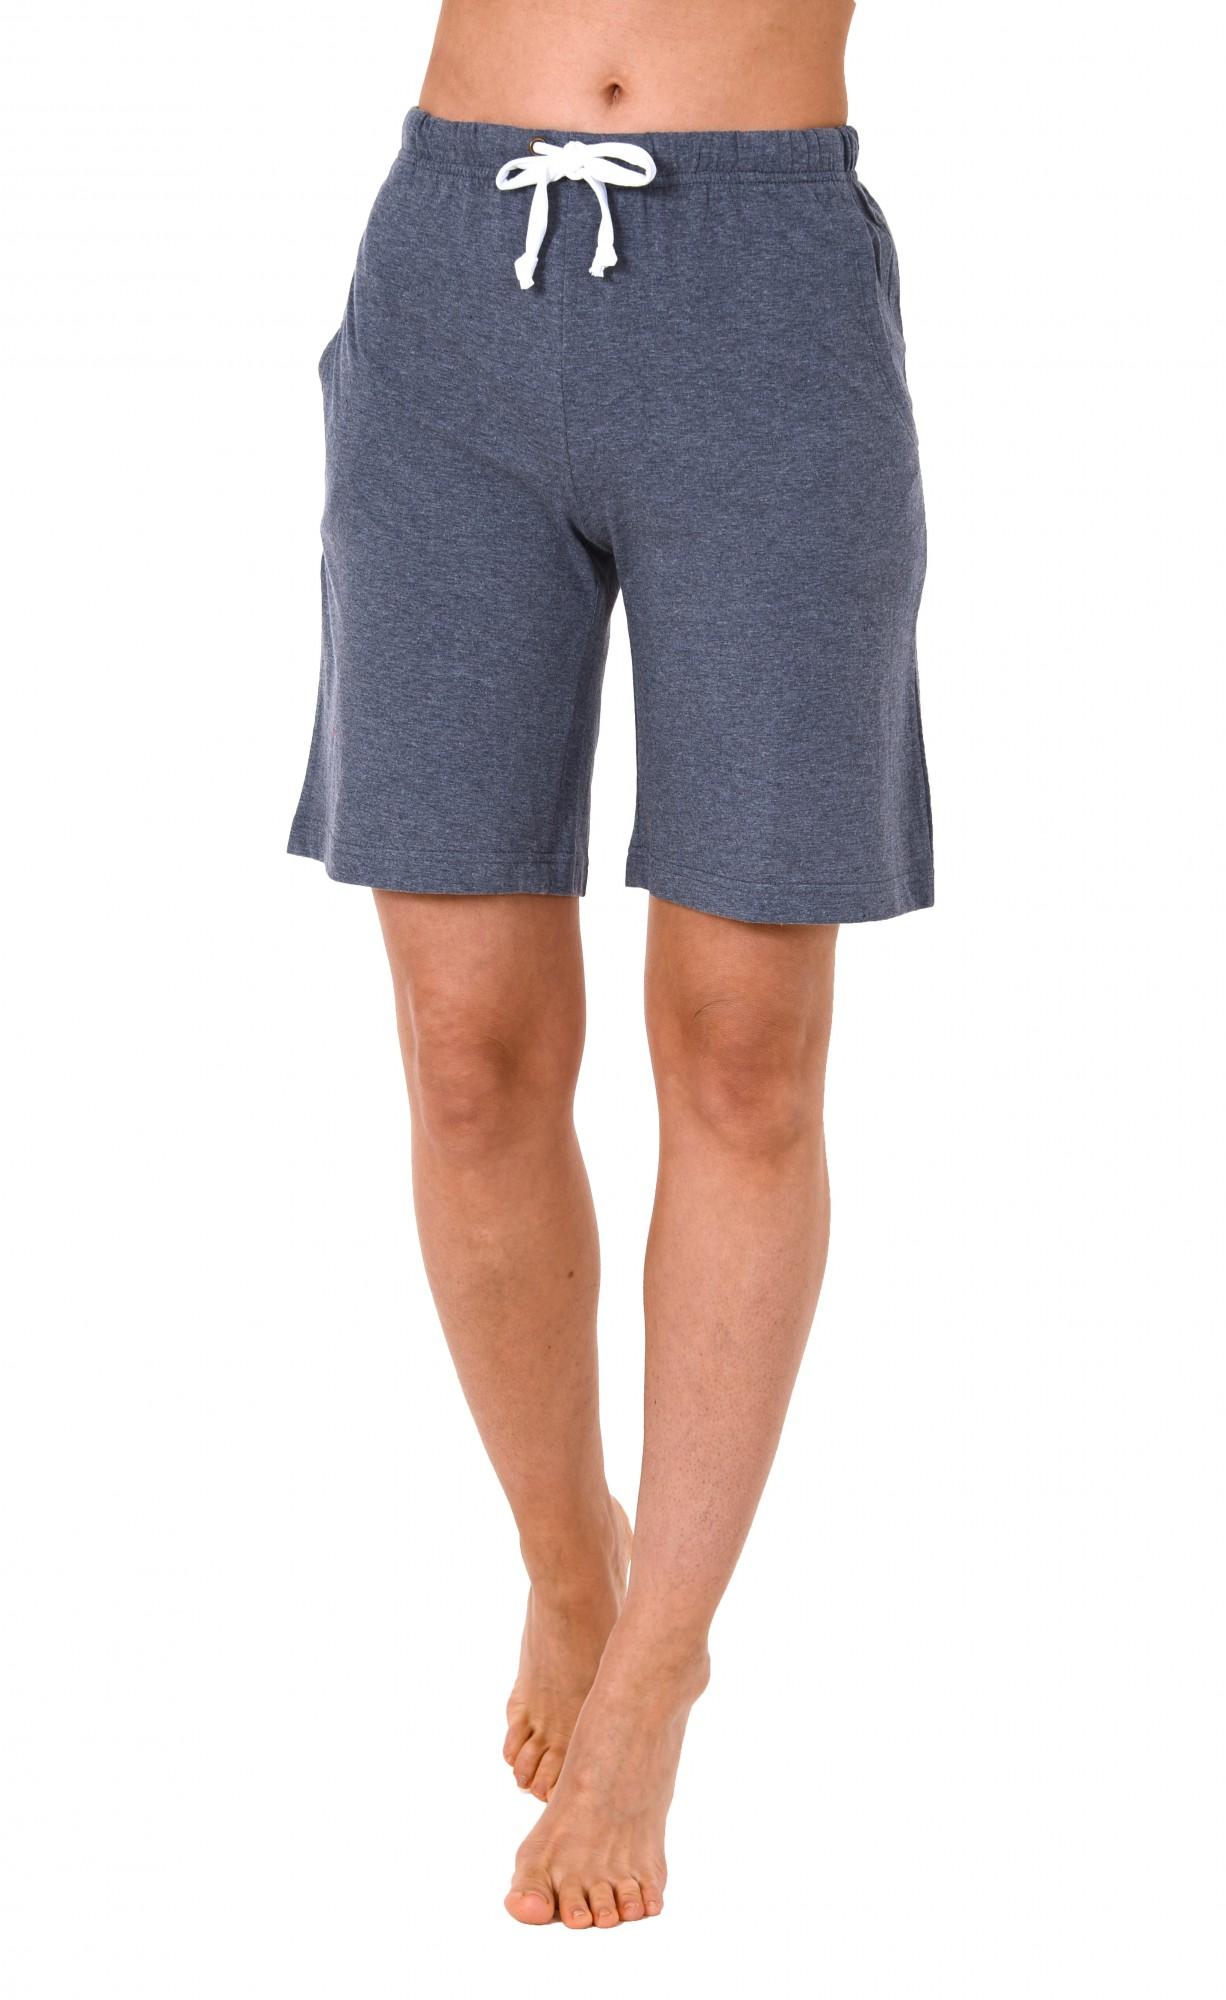 Damen Pyjama Bermuda kurze Hose  - Mix & Match - ideal zum kombinieren  224 90 902 – Bild 1